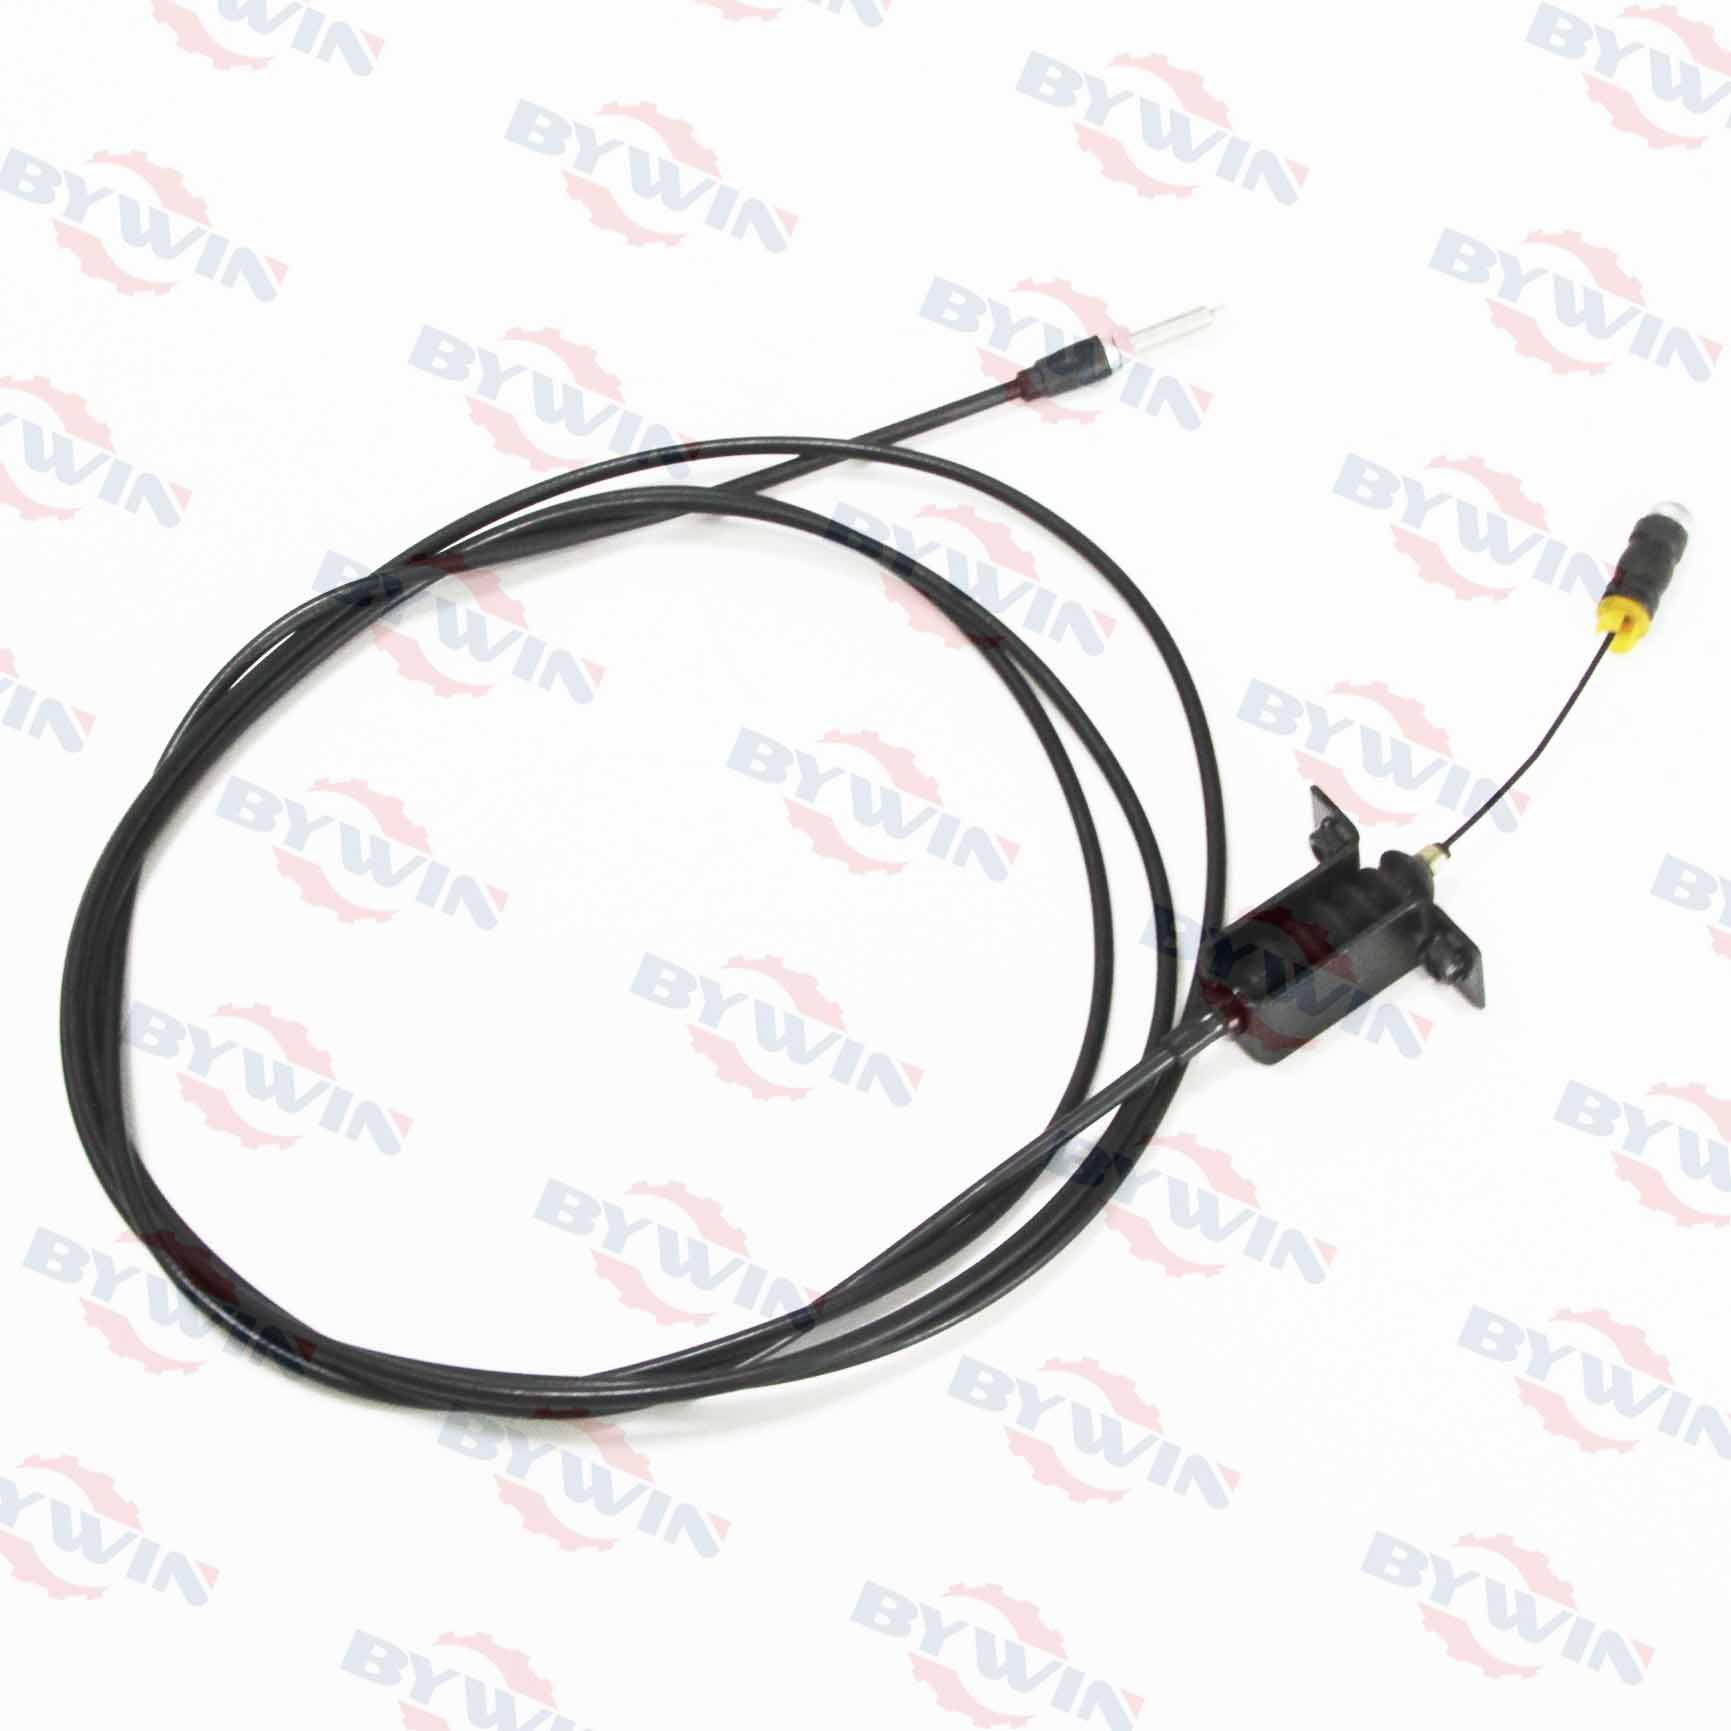 New Throttle  Cable 7081632 Replace Polaris RZR 4  800 Robby Gordon Edition